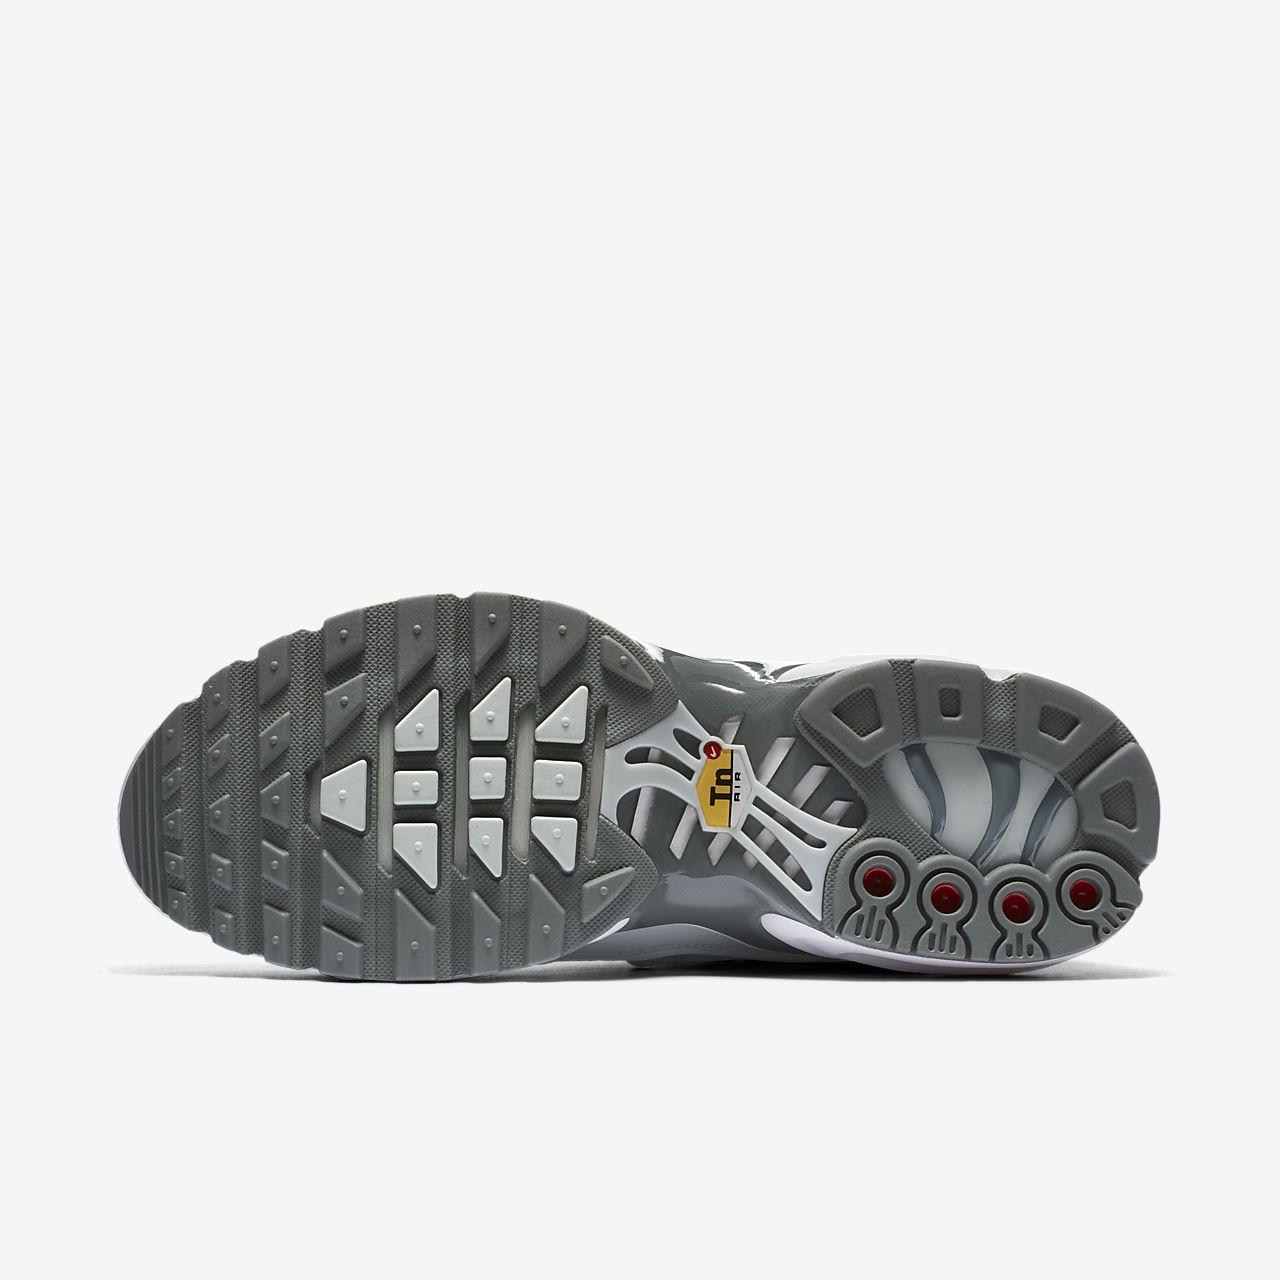 new styles 357fe 05d4a Wo Zu Kaufen RabattSpielraum Store Damen Schuhe sneakers Nike Air ...